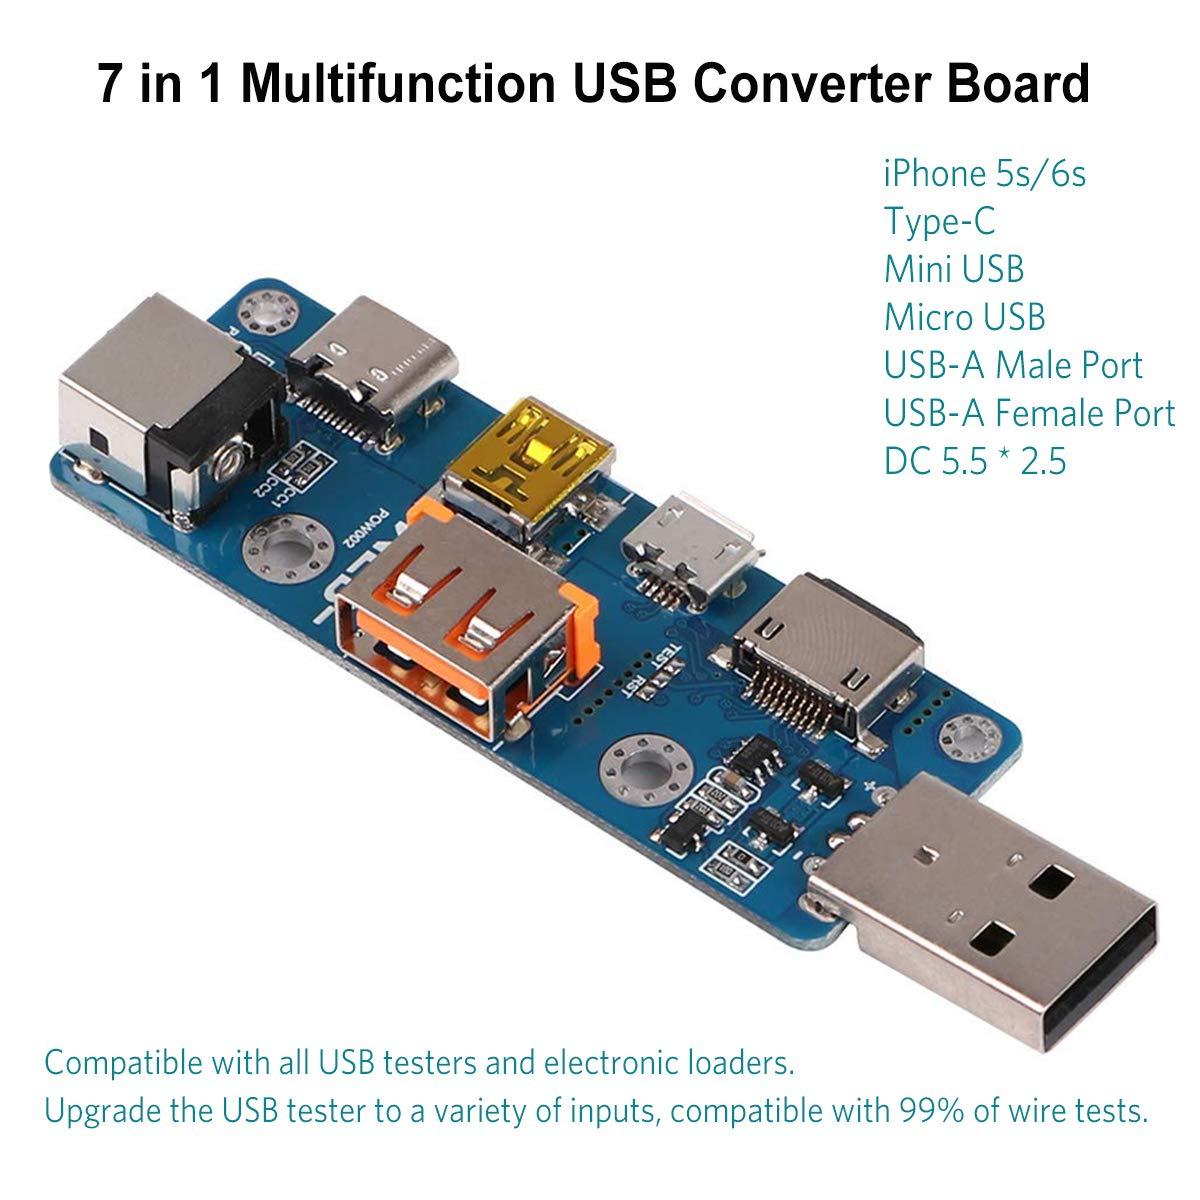 Makerhawk Usb Converter Board 7 In 1 Multifunction Testing Circuit Tester Meter Multimeter Ammeter Capacity Monitor Instruments Parts Type C Micro Mini